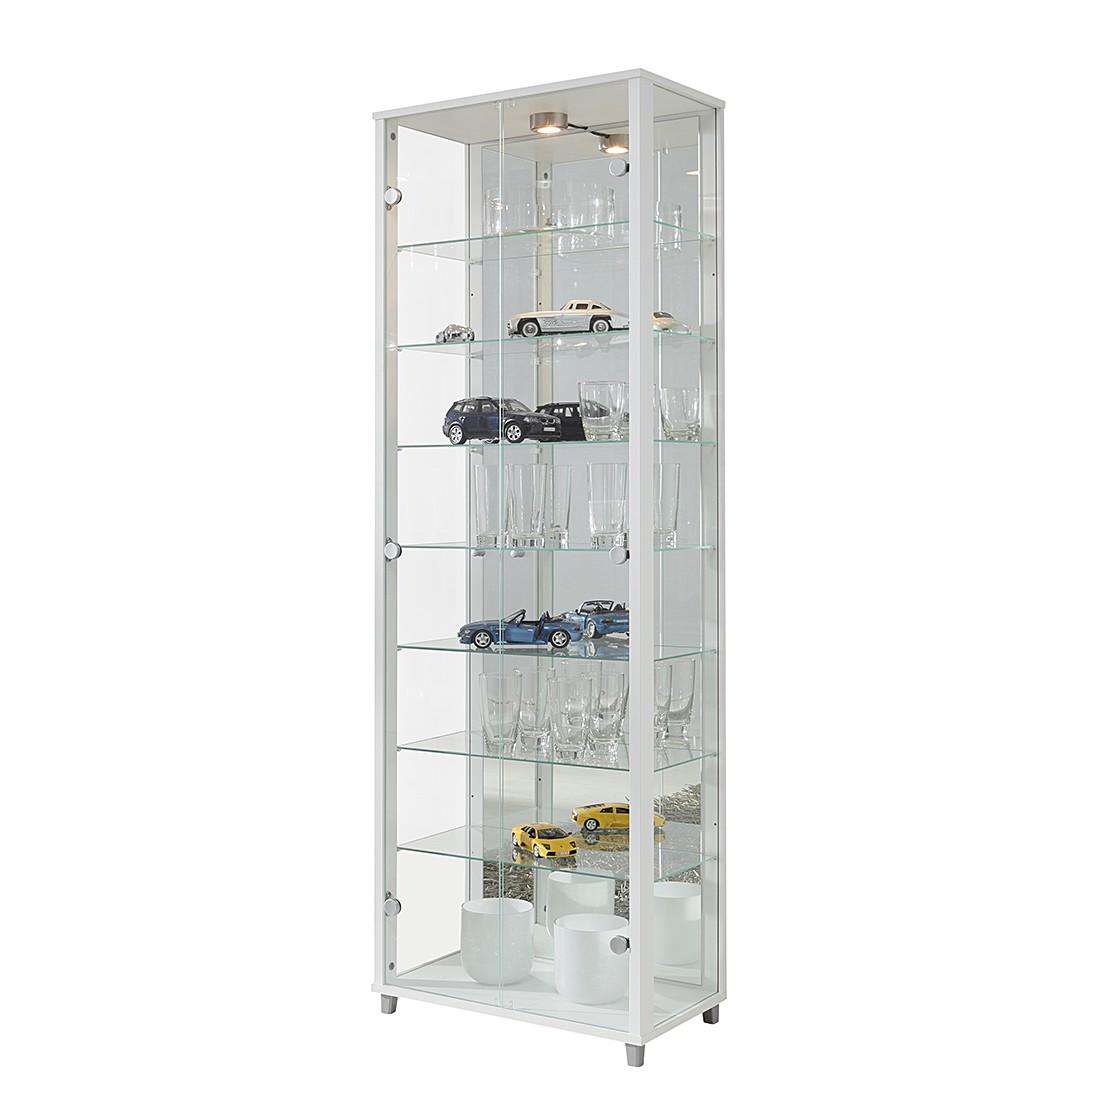 Home 24 - Eek b, vitrine winnipeg ii - verre clair / blanc - avec 7 étagères, modoform